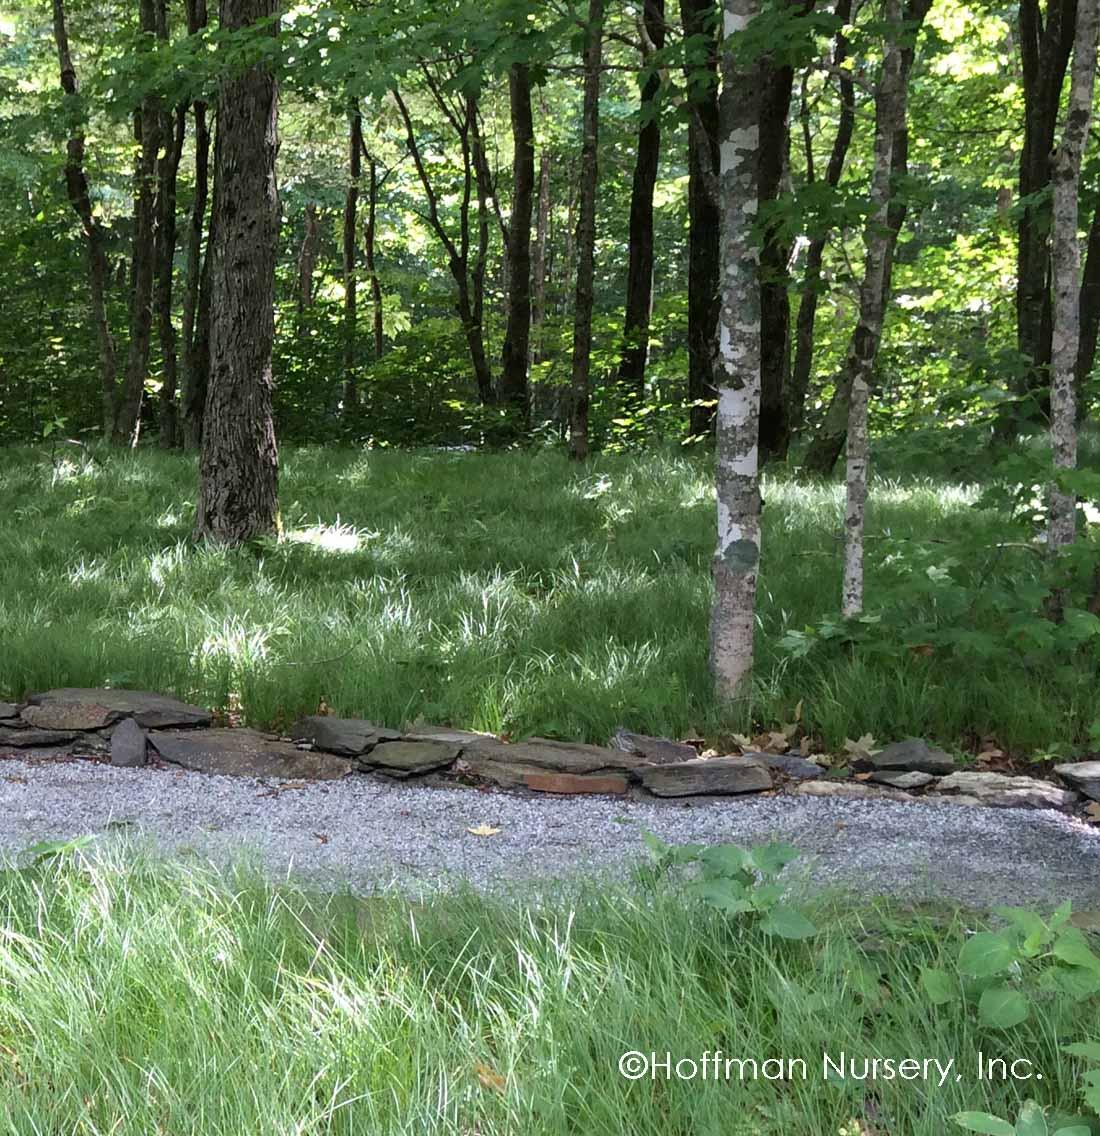 Carex pensylvanica - Zone: 4-8Native: YesEvergreen: Semi Foliage Color: GreenSpreads: RhizomesHeight: 6